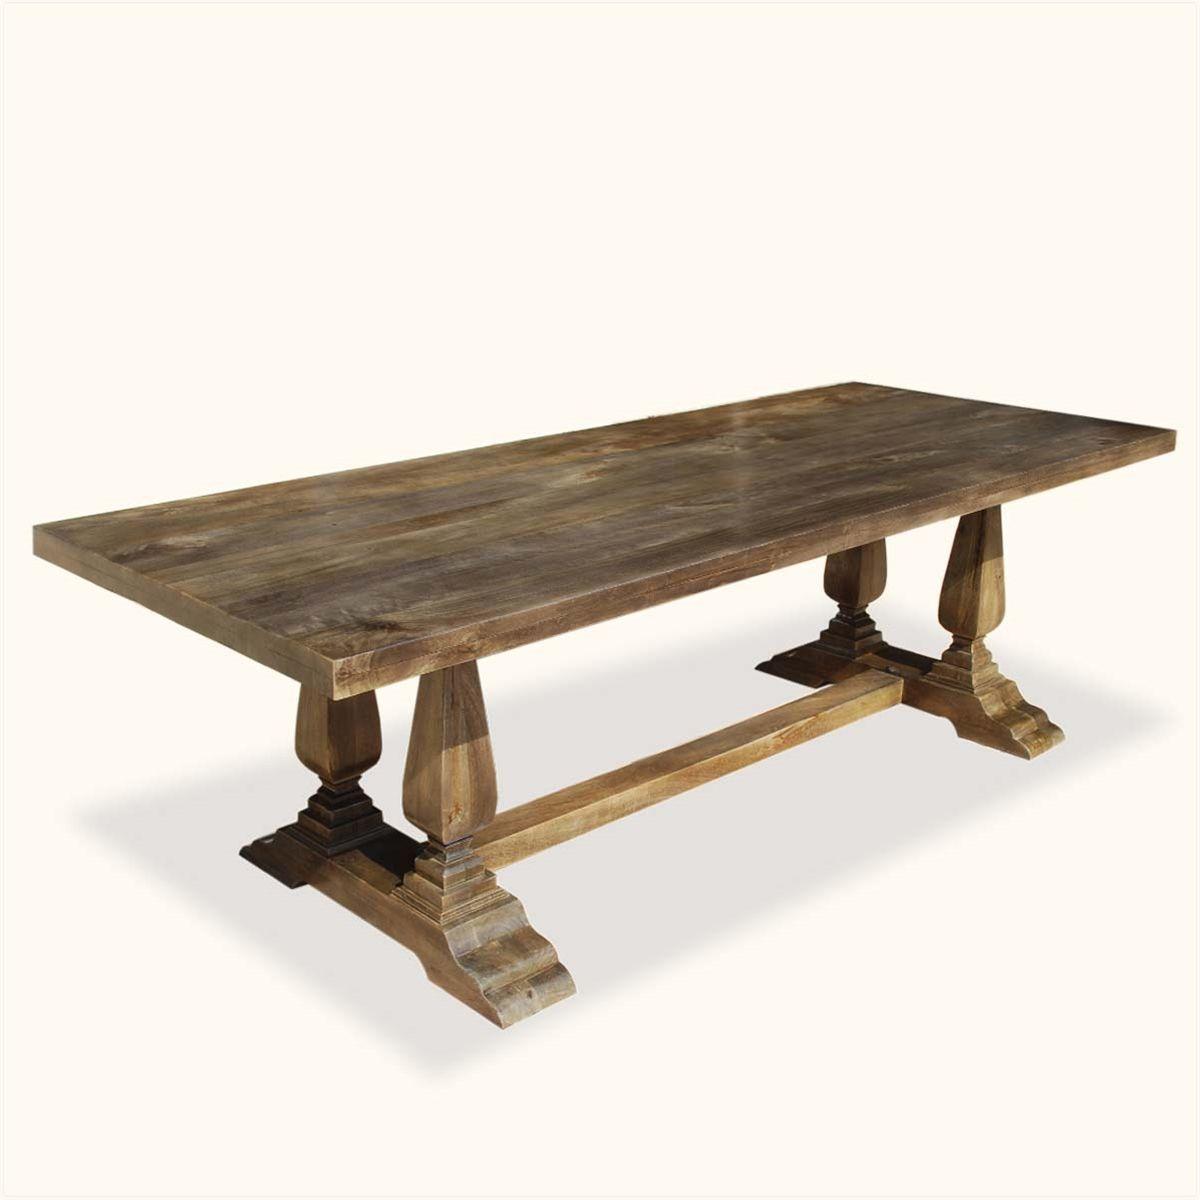 Pelham Rustic 98 Solid Wood Trestle Pedestal Dining Table